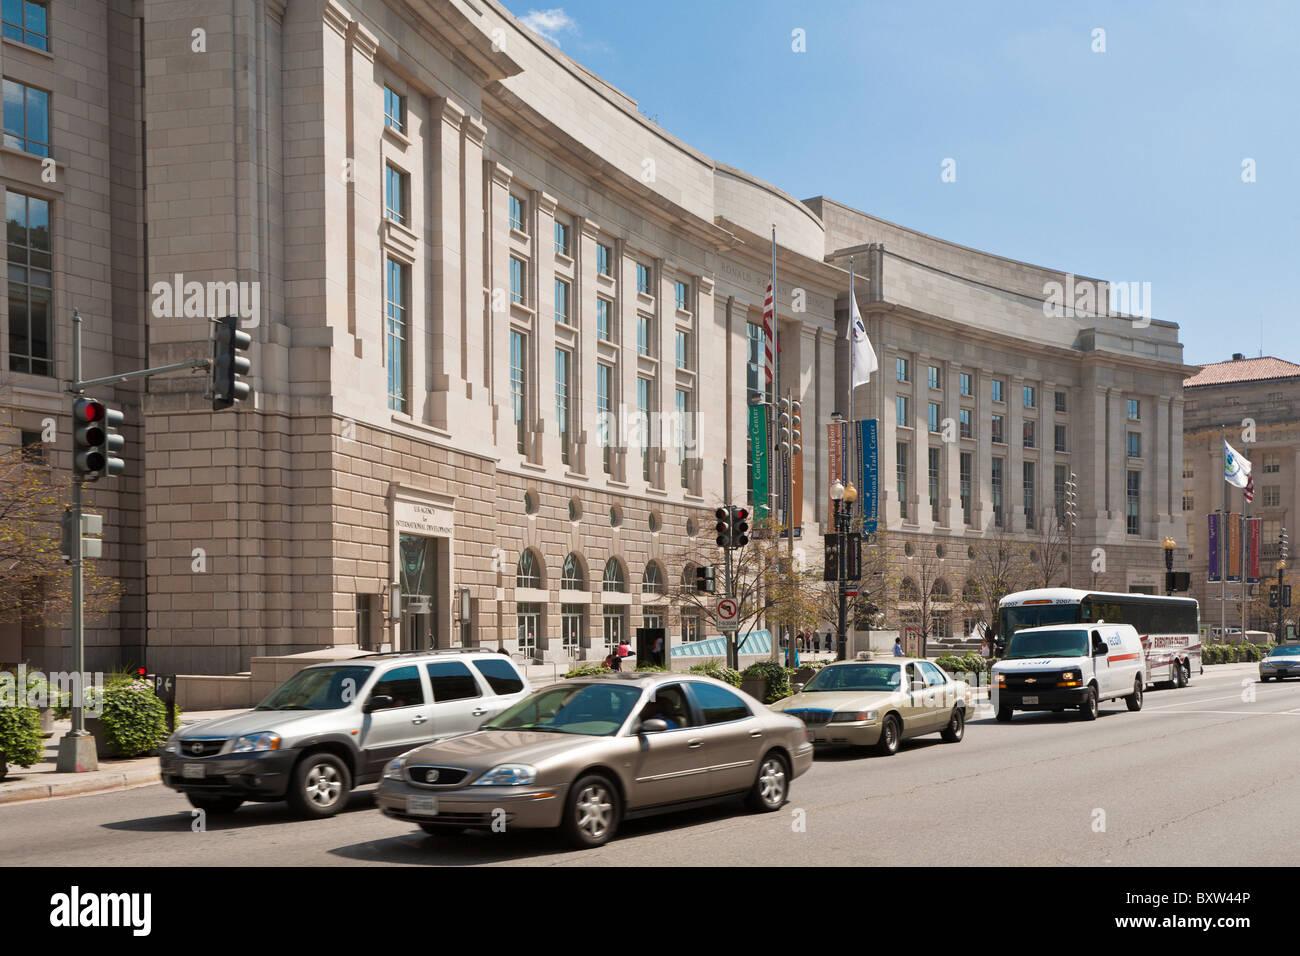 Washington DC - Sep 2009 - The Ronald Reagan building in Washington DC - Stock Image